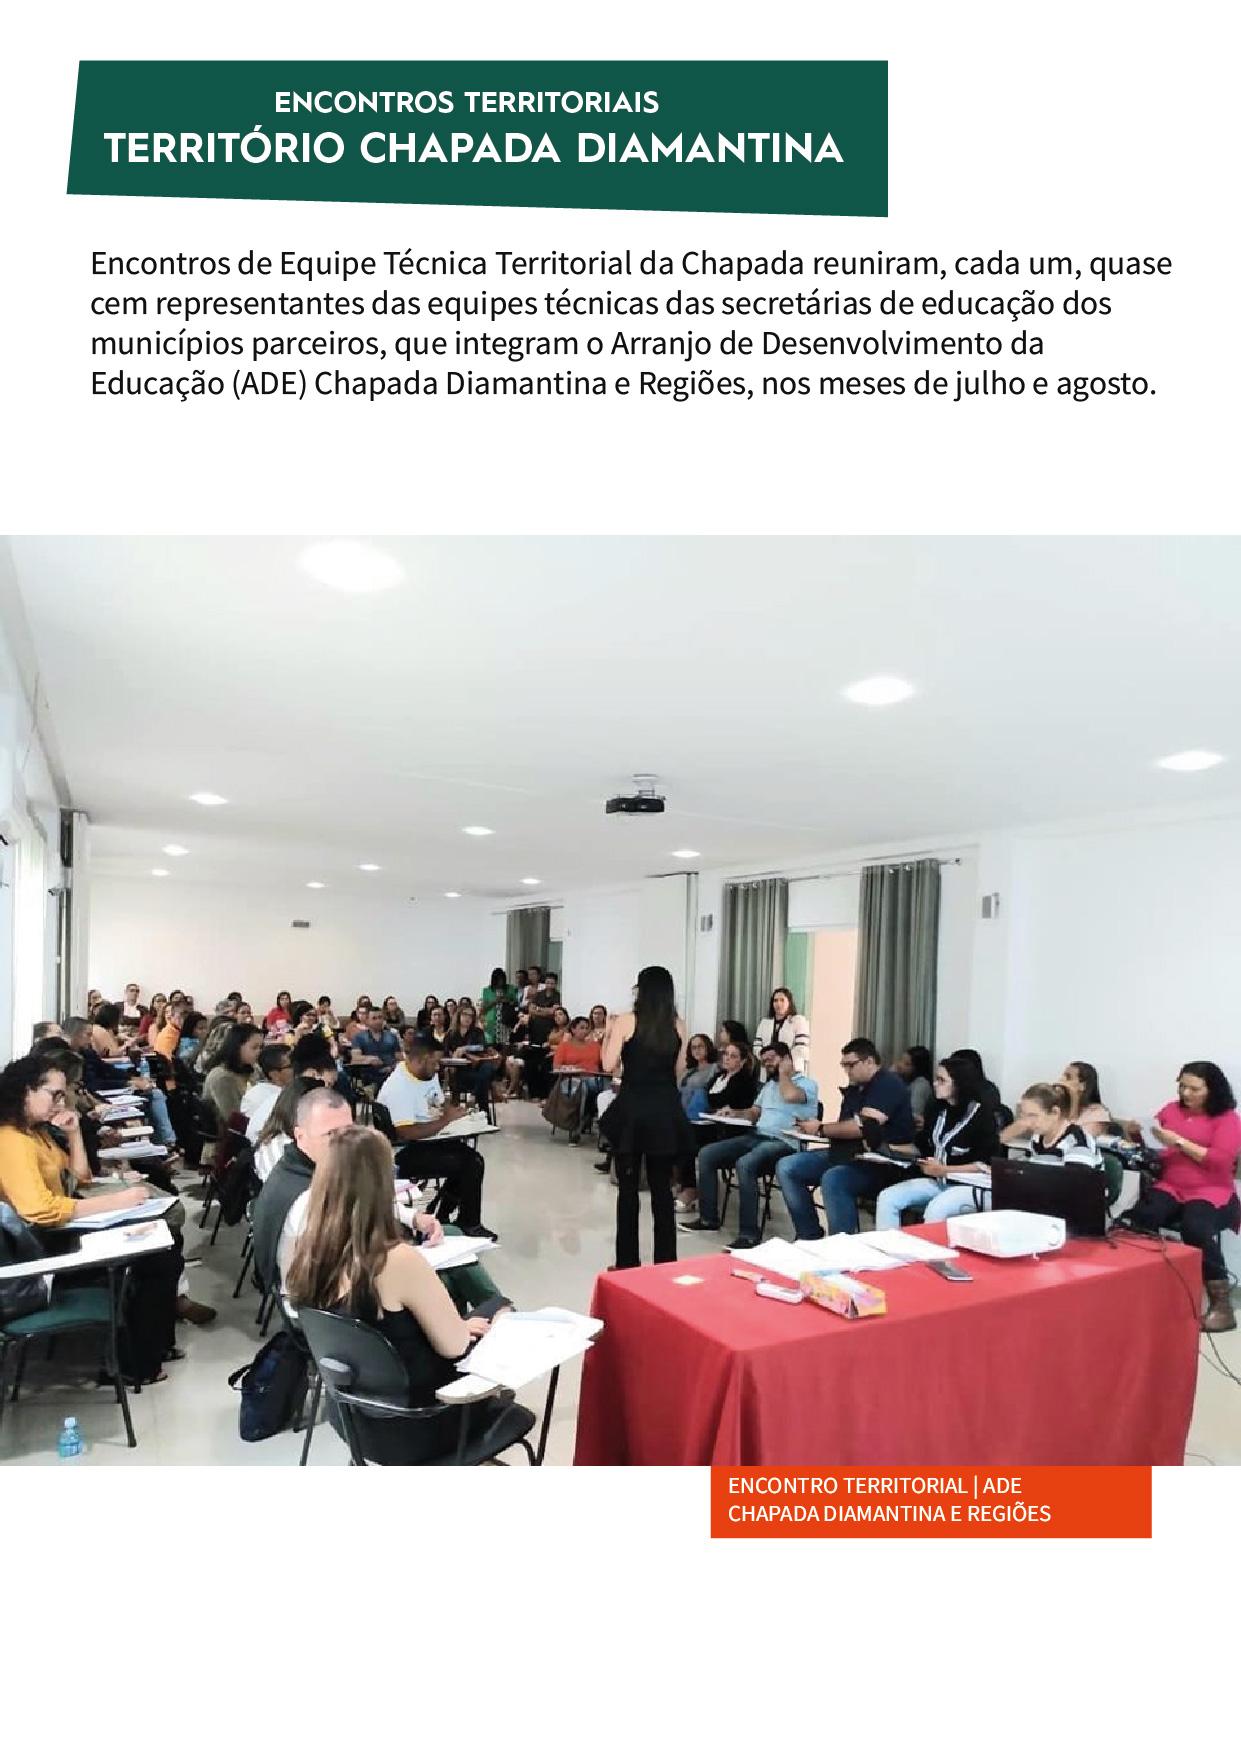 ICEP - Boletim edição 2, versão impressa_Fundo copy 2